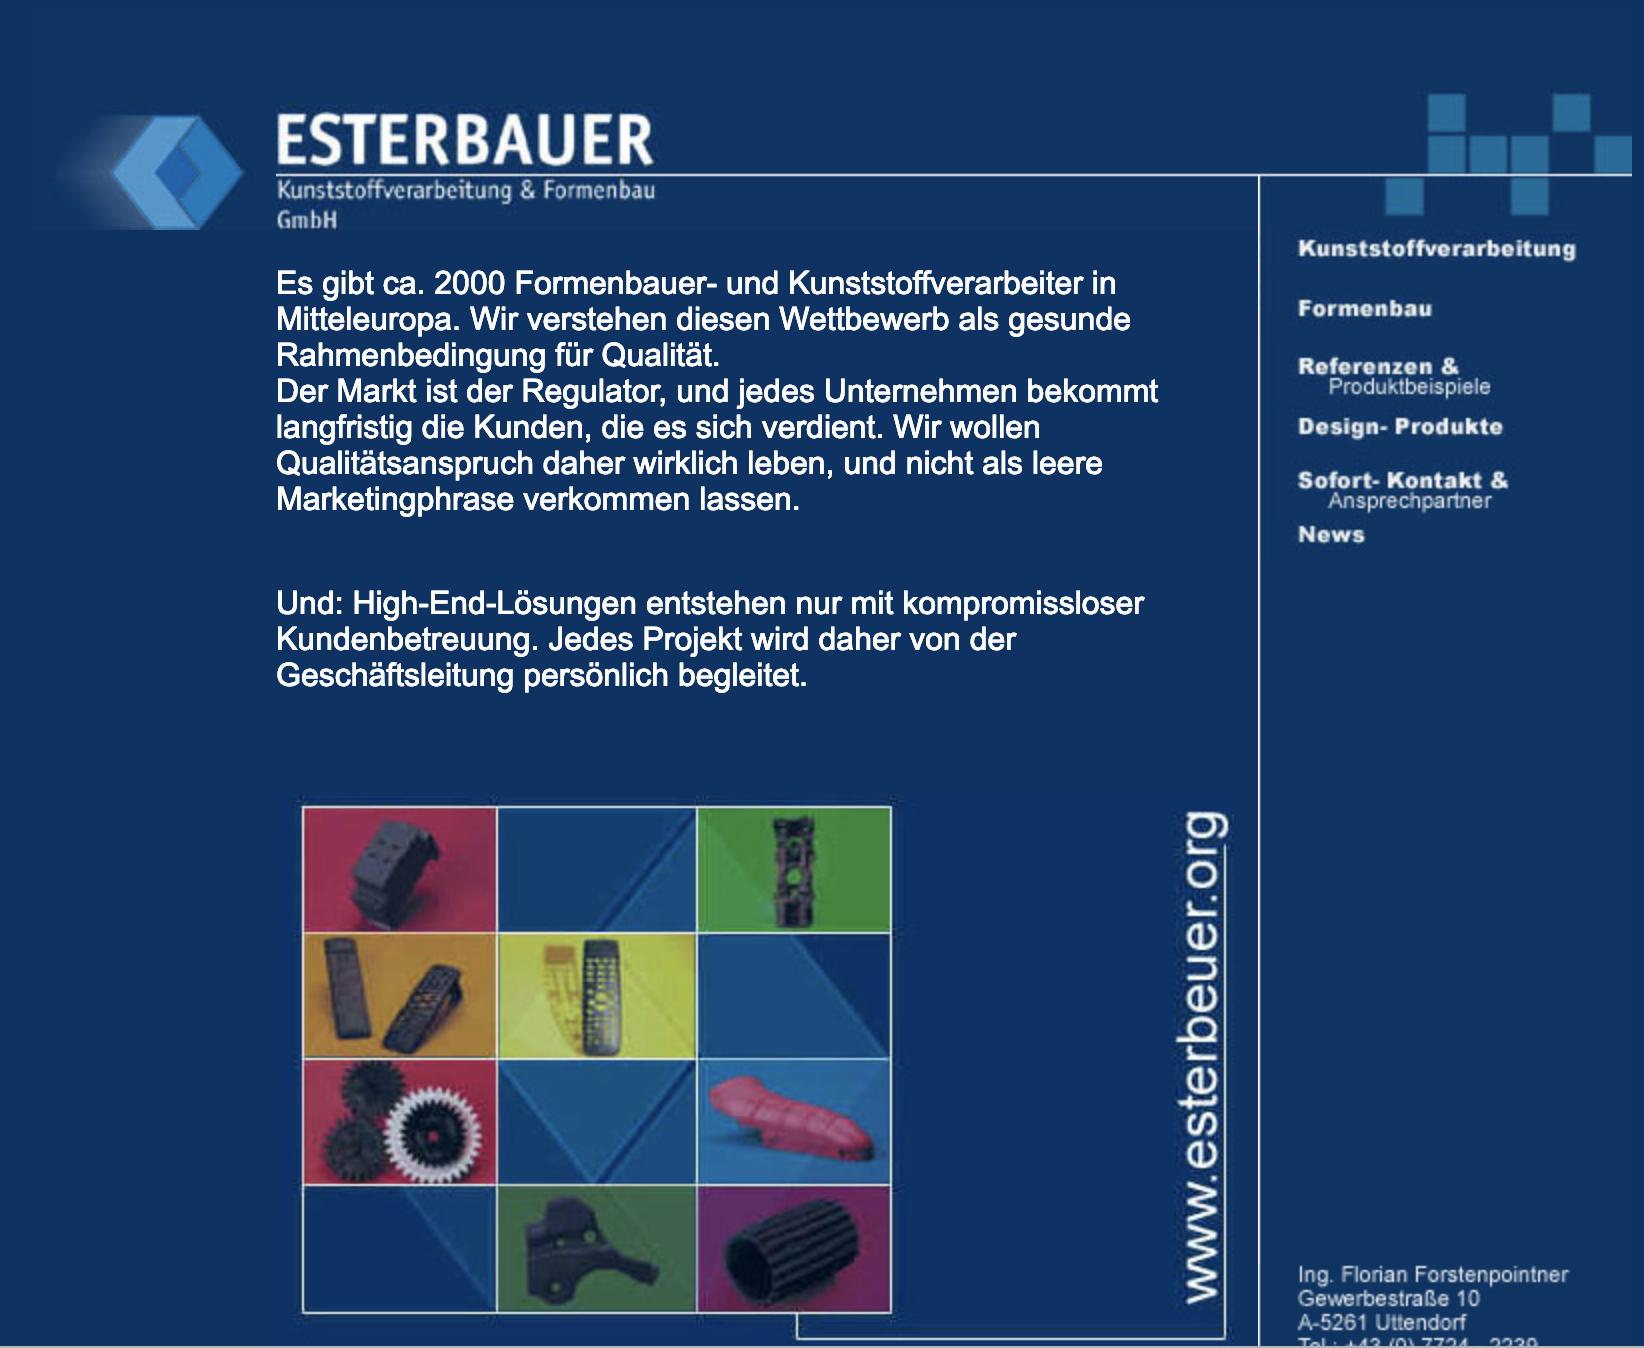 Esterbauer Kunststoff